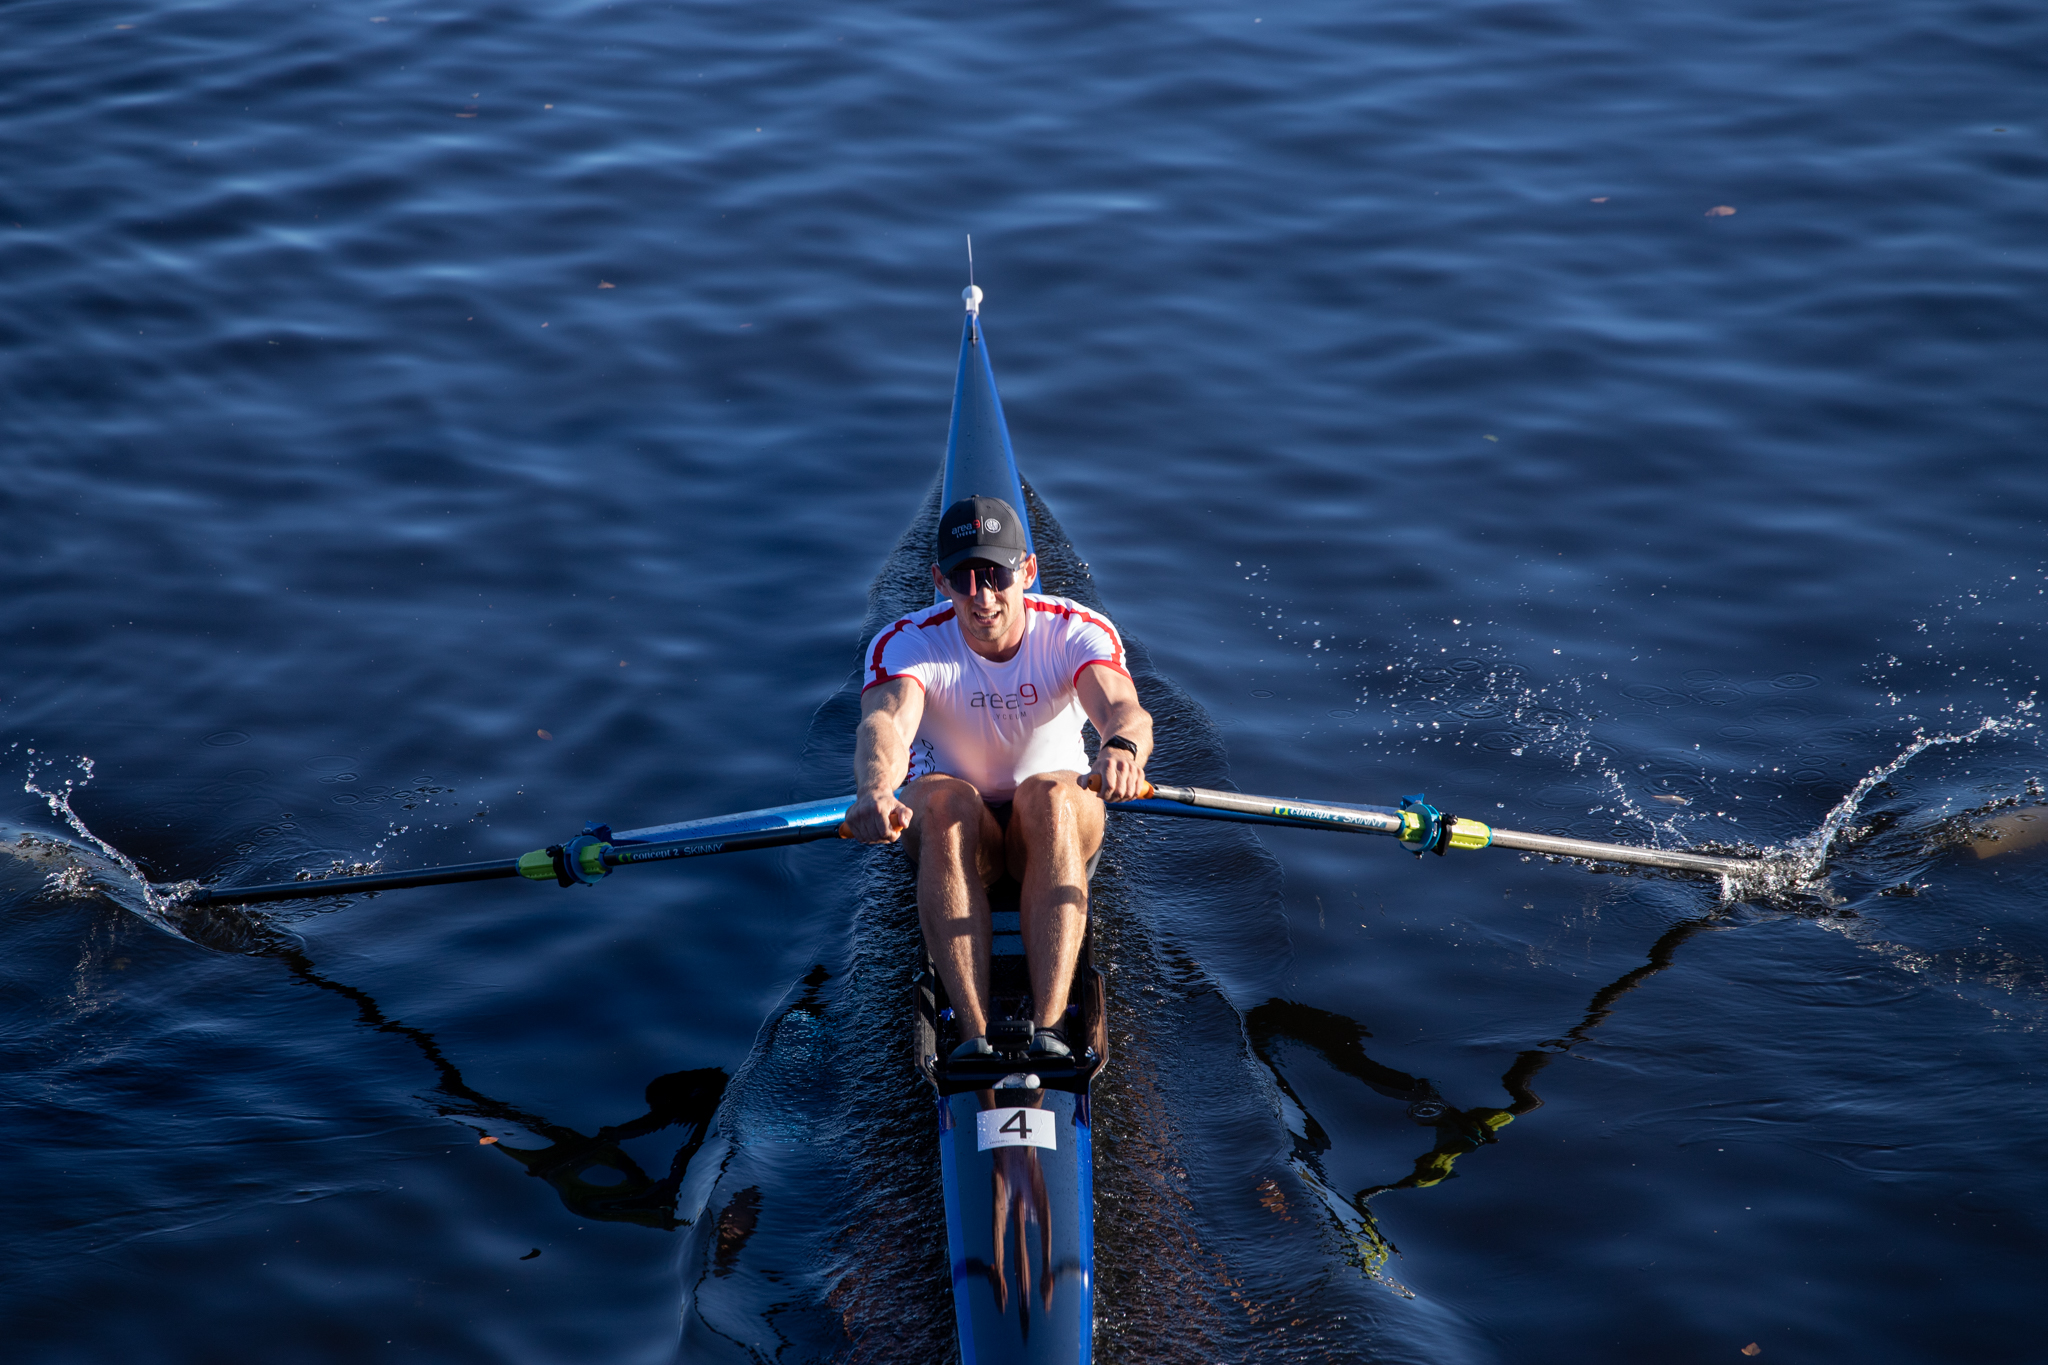 Sverri Nielsen Brings International Flavor to Men's 1X